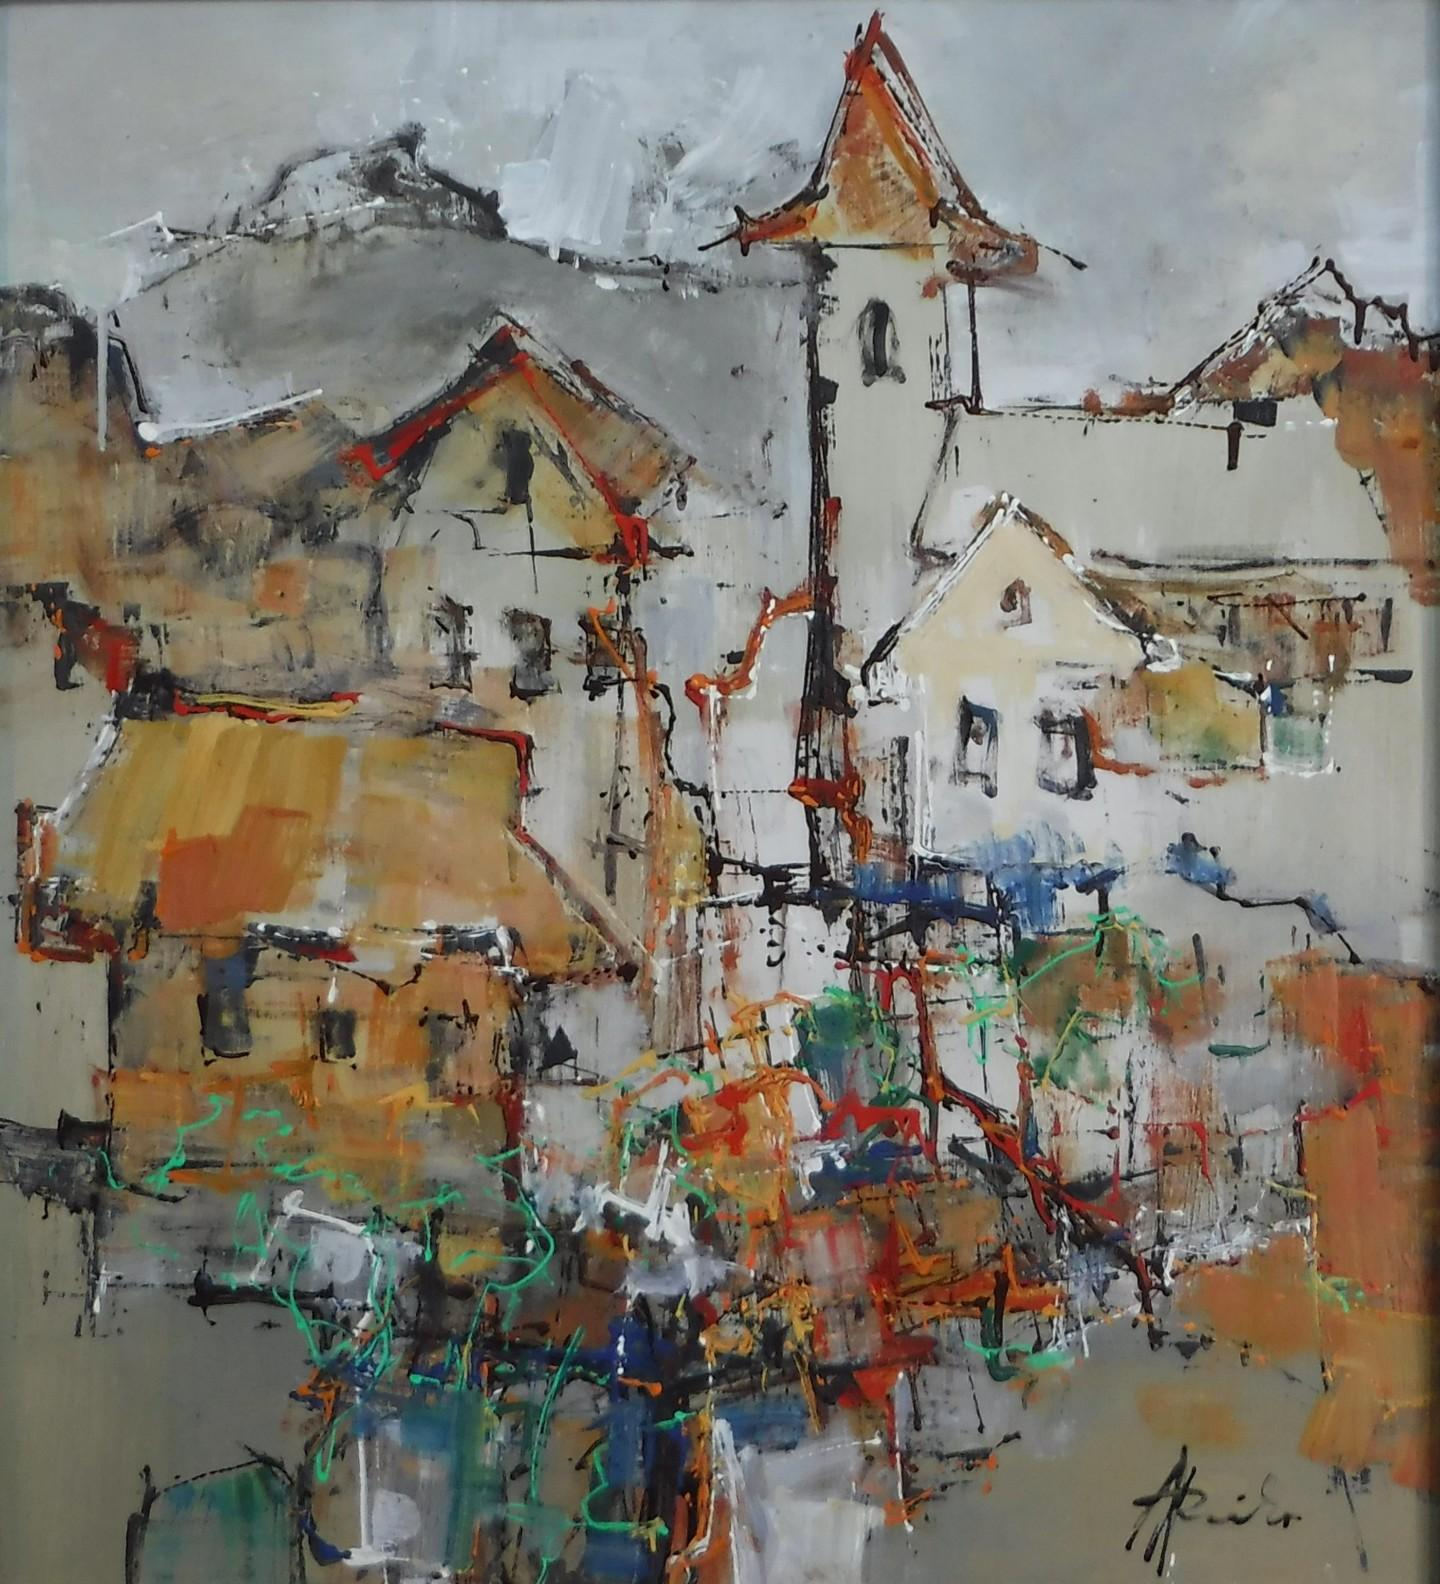 Martin Racko - Summer in our village